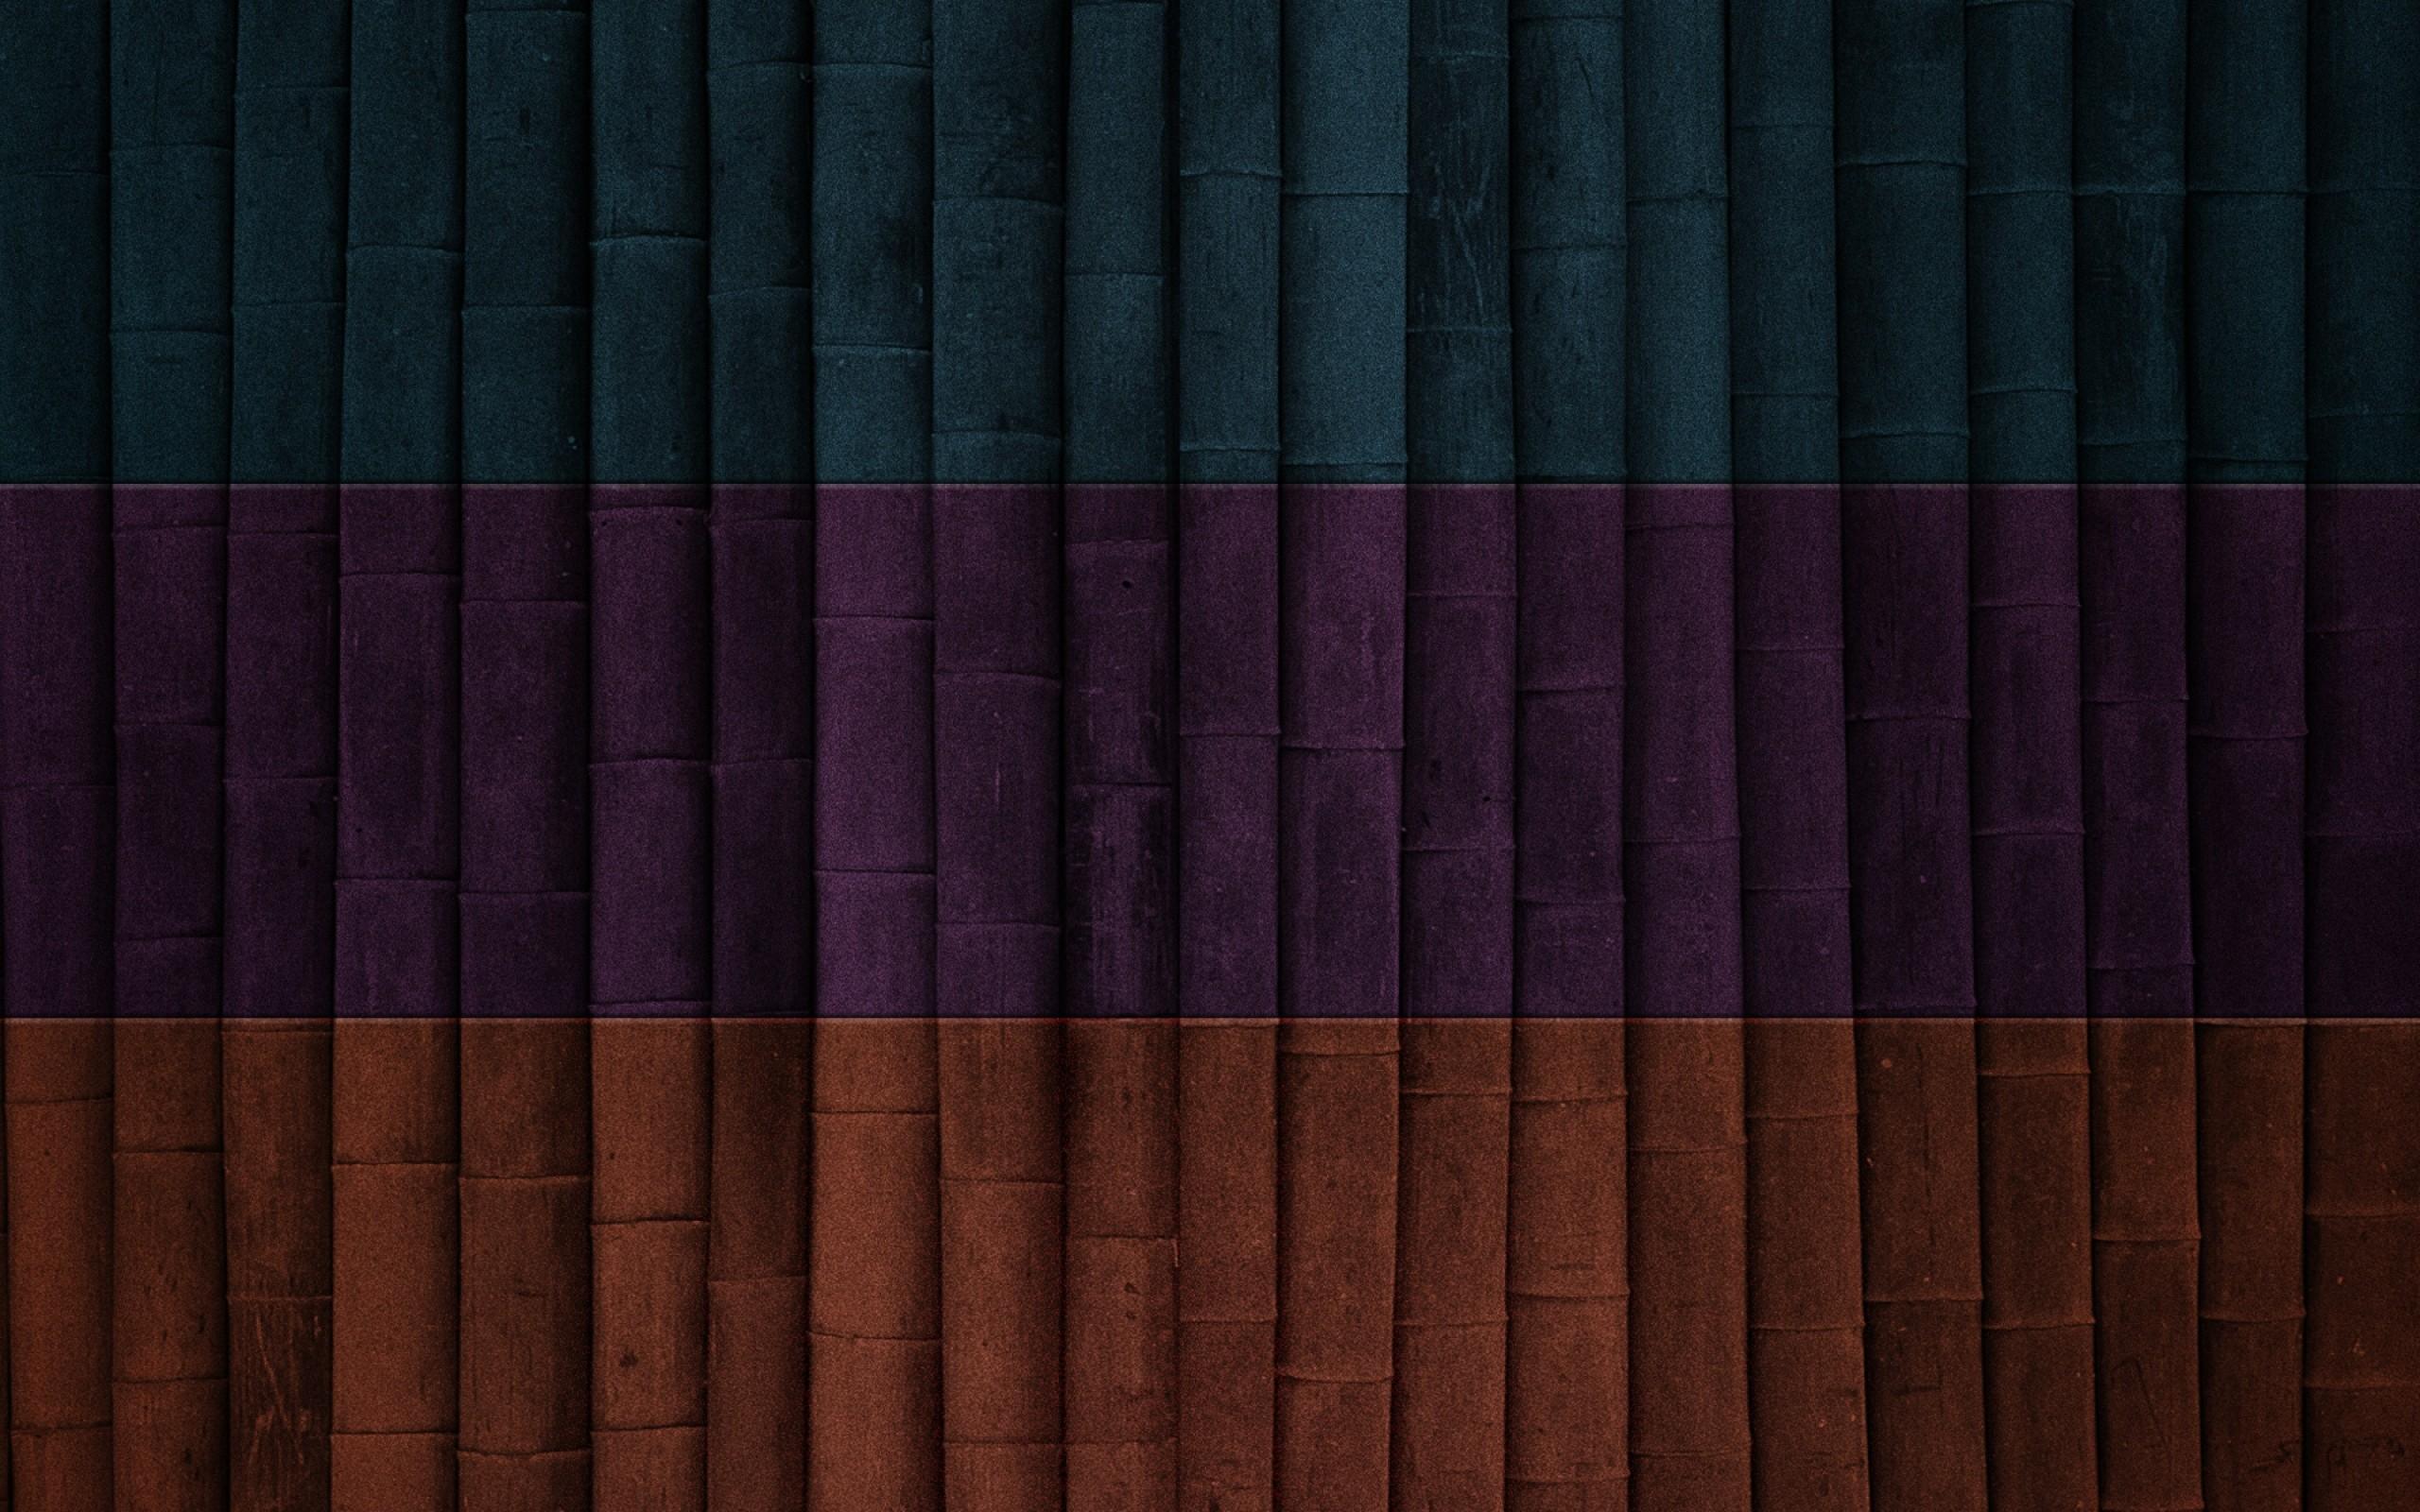 Wallpaper texture, stripes, blue, purple, orange, black